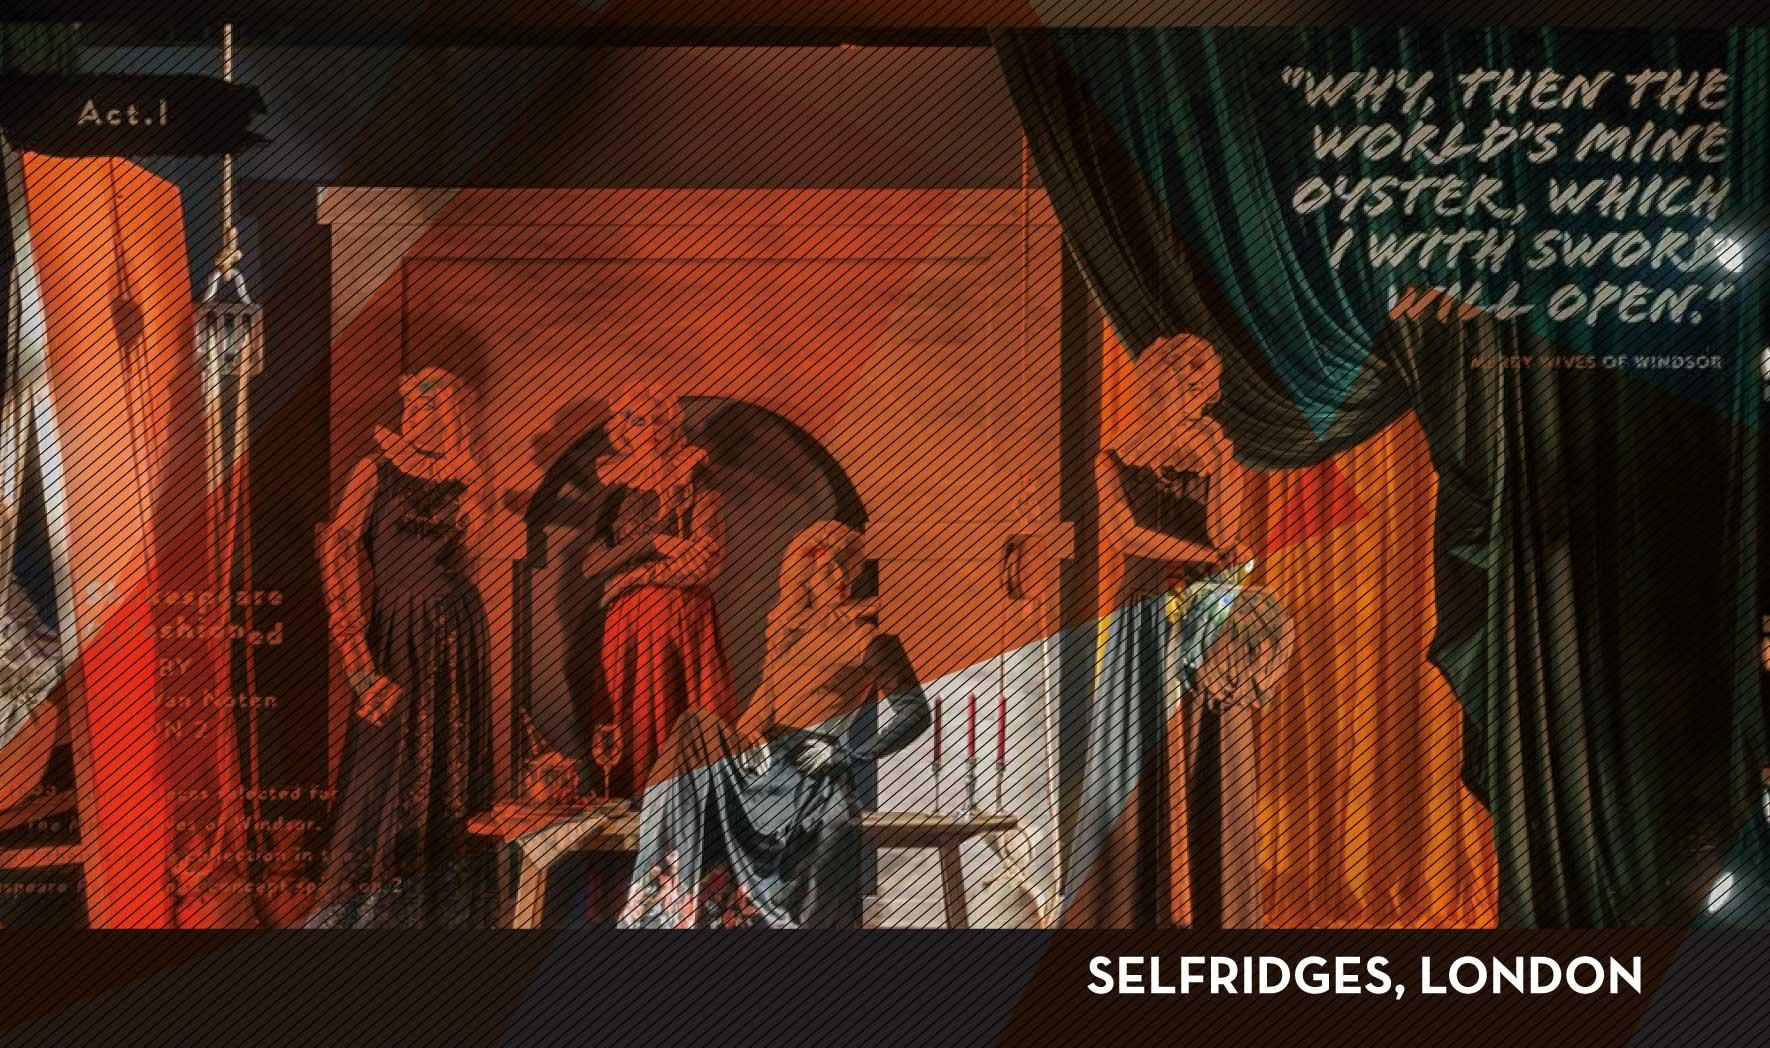 Selfridges Shakespeare Hommage